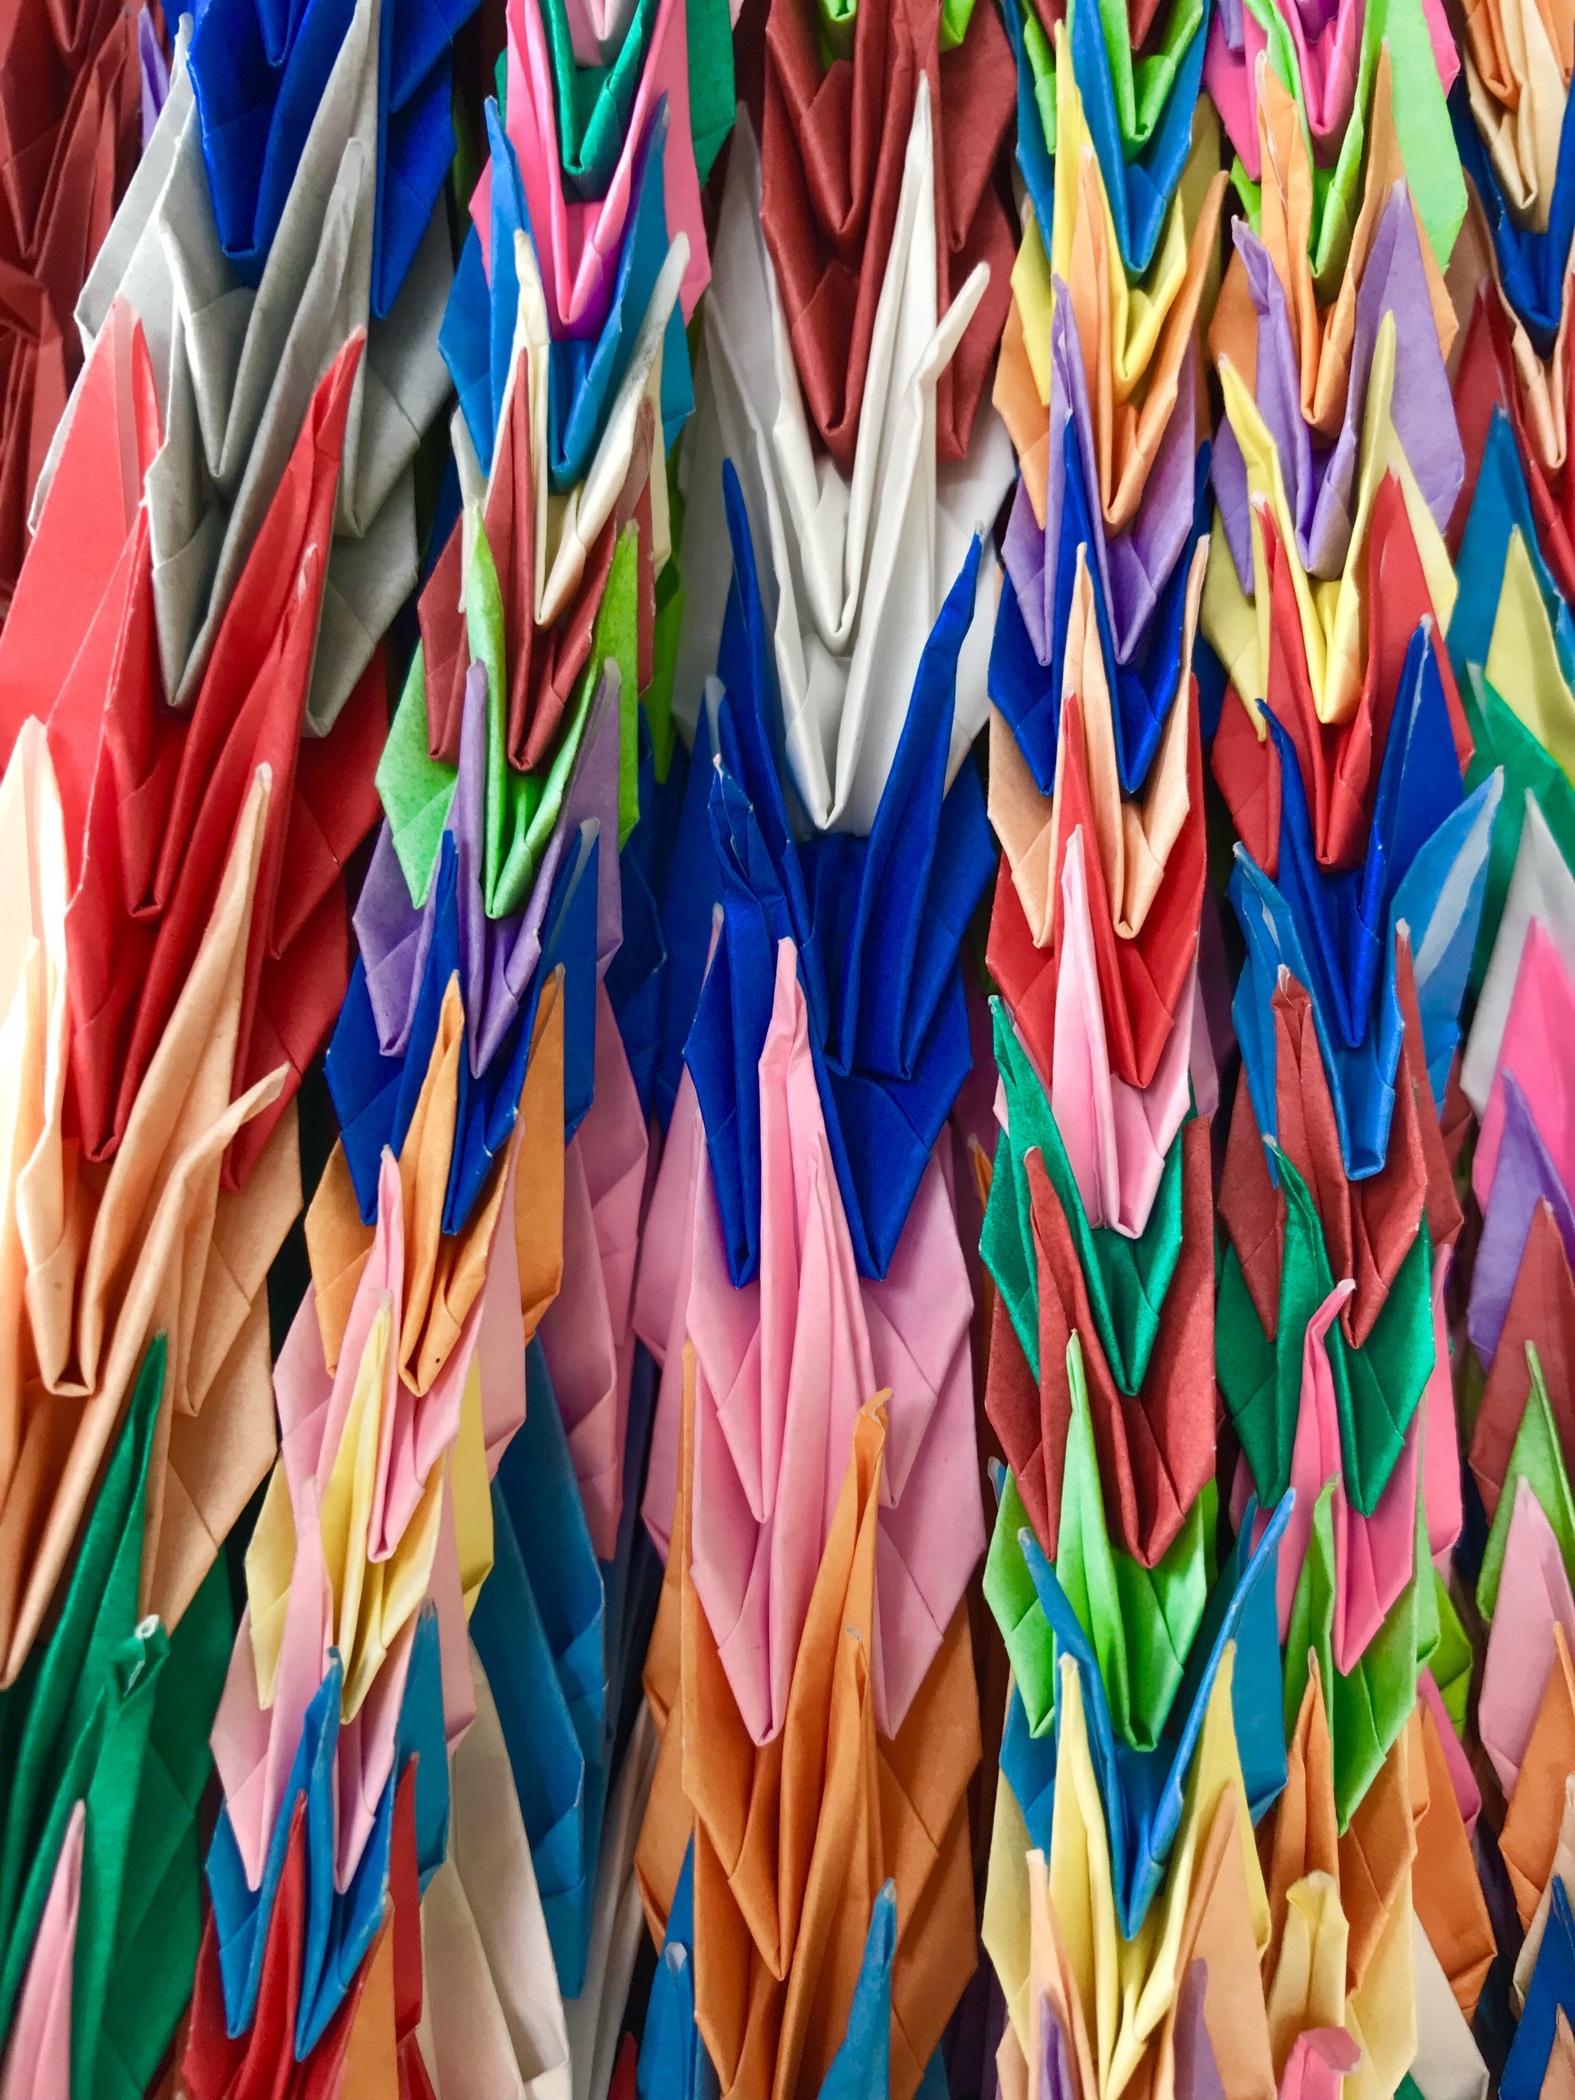 Takayama, Japan - Colors